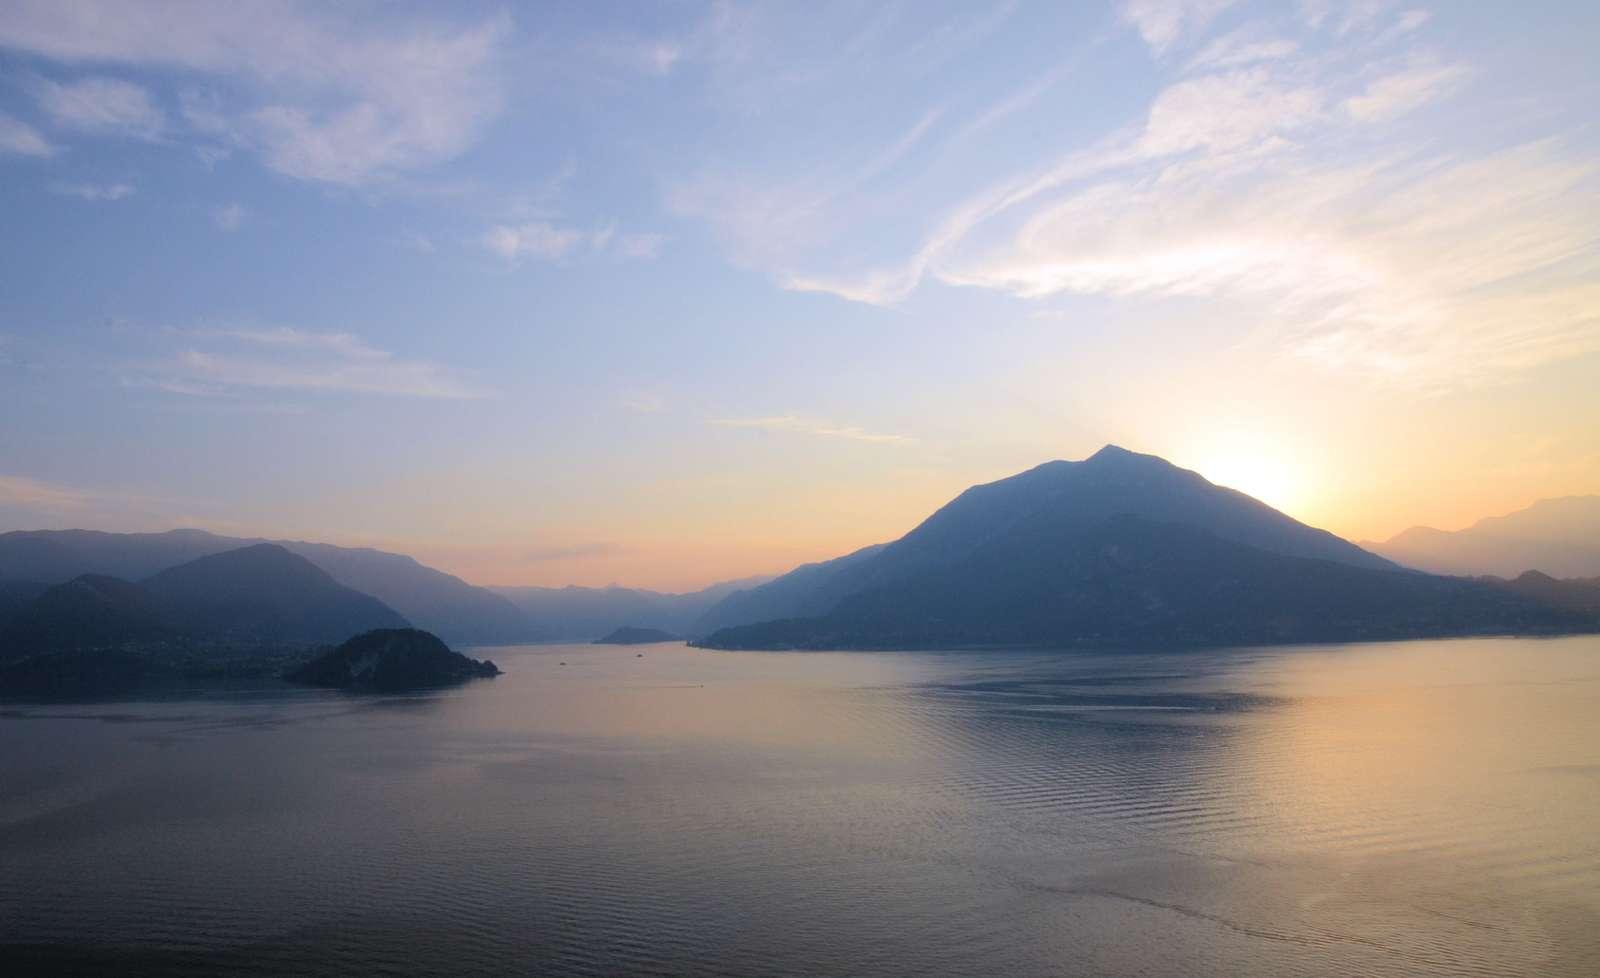 Solnedgangen over Comosøen kan nydes fra restauranten